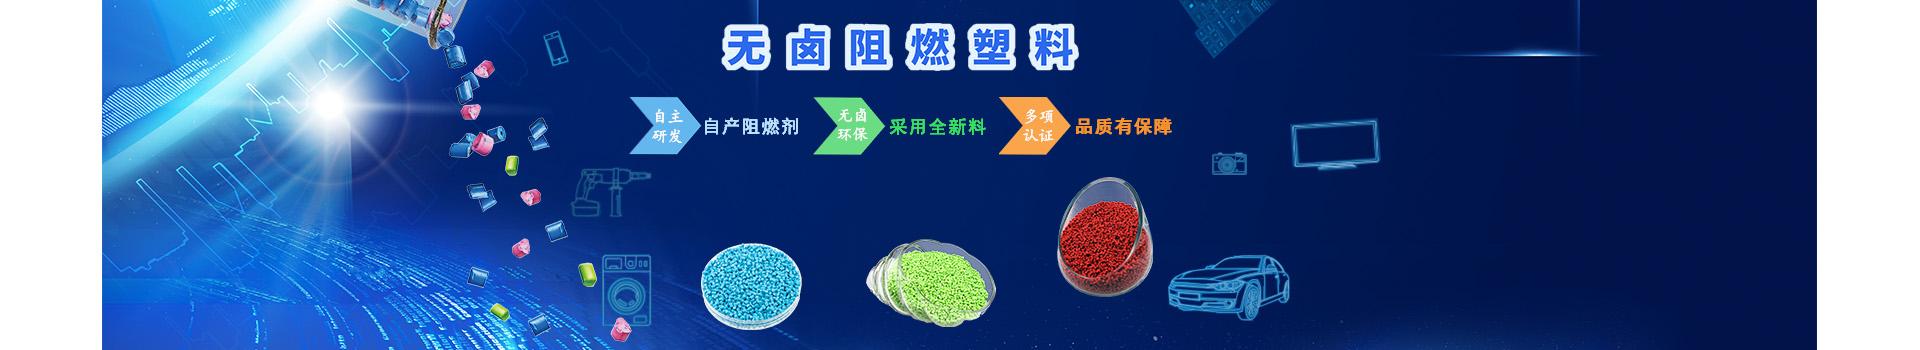 聚石资讯-banner图